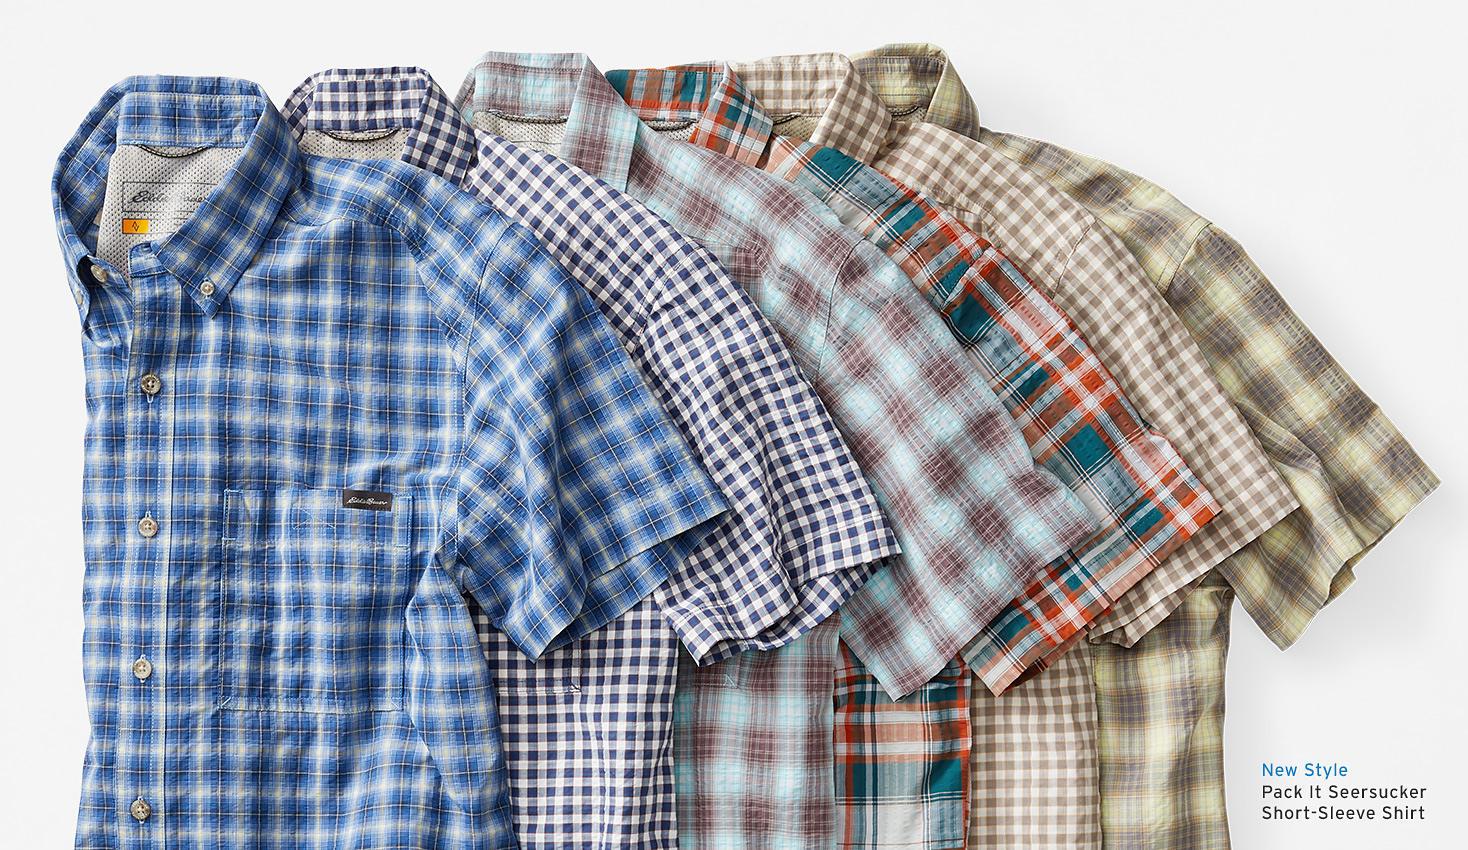 Lay down of various baja shirt colorways